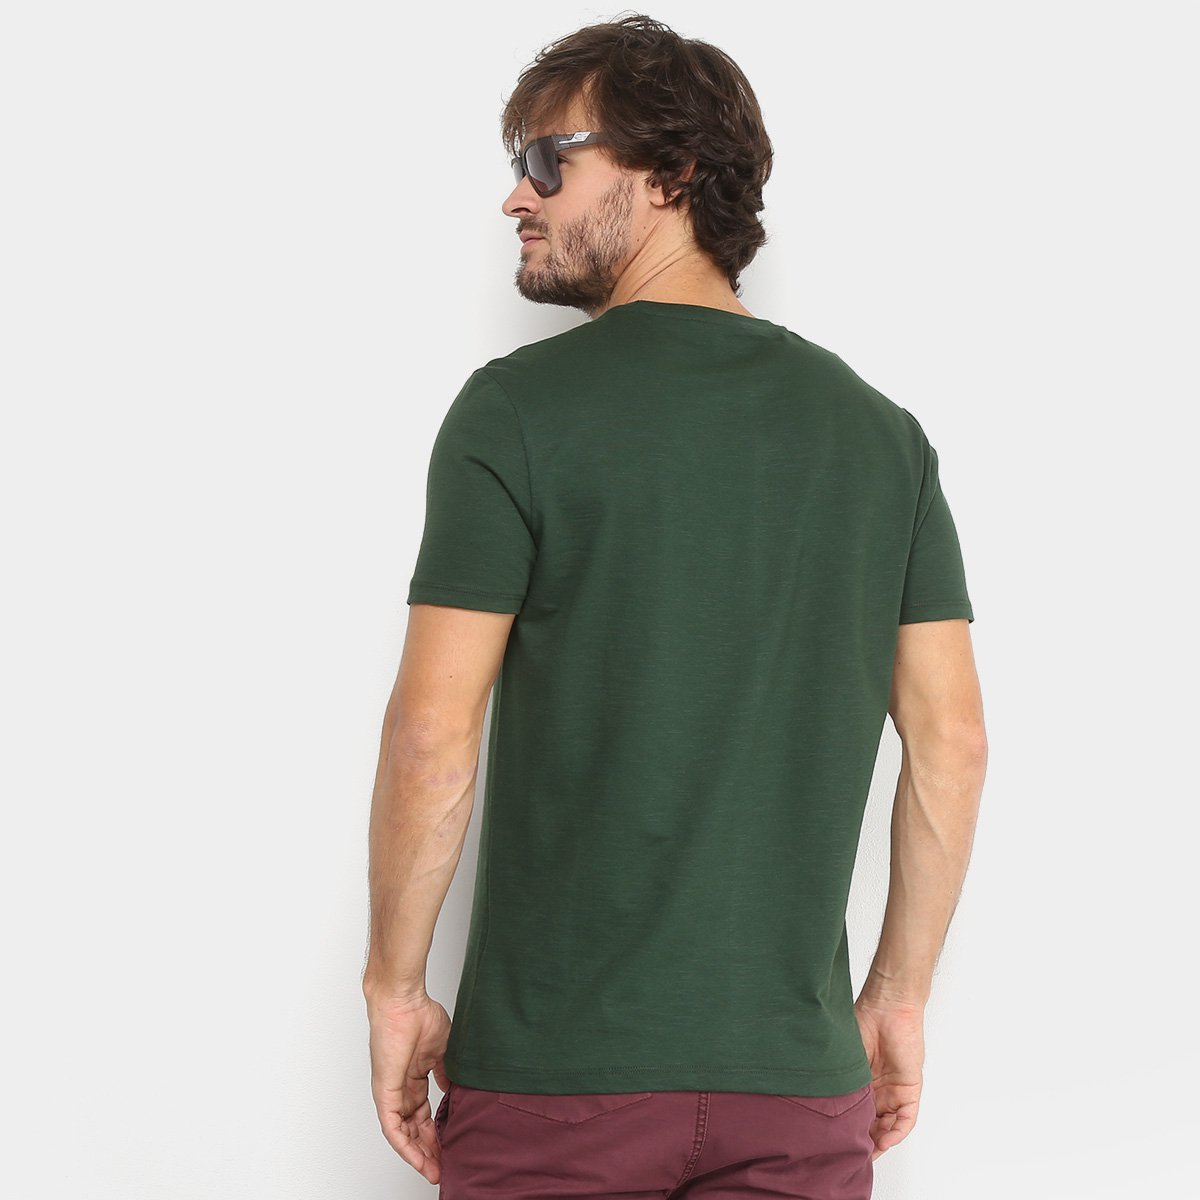 Camiseta Calvin Klein Básica Masculina  Camiseta Calvin Klein Básica  Masculina ... b470127d45